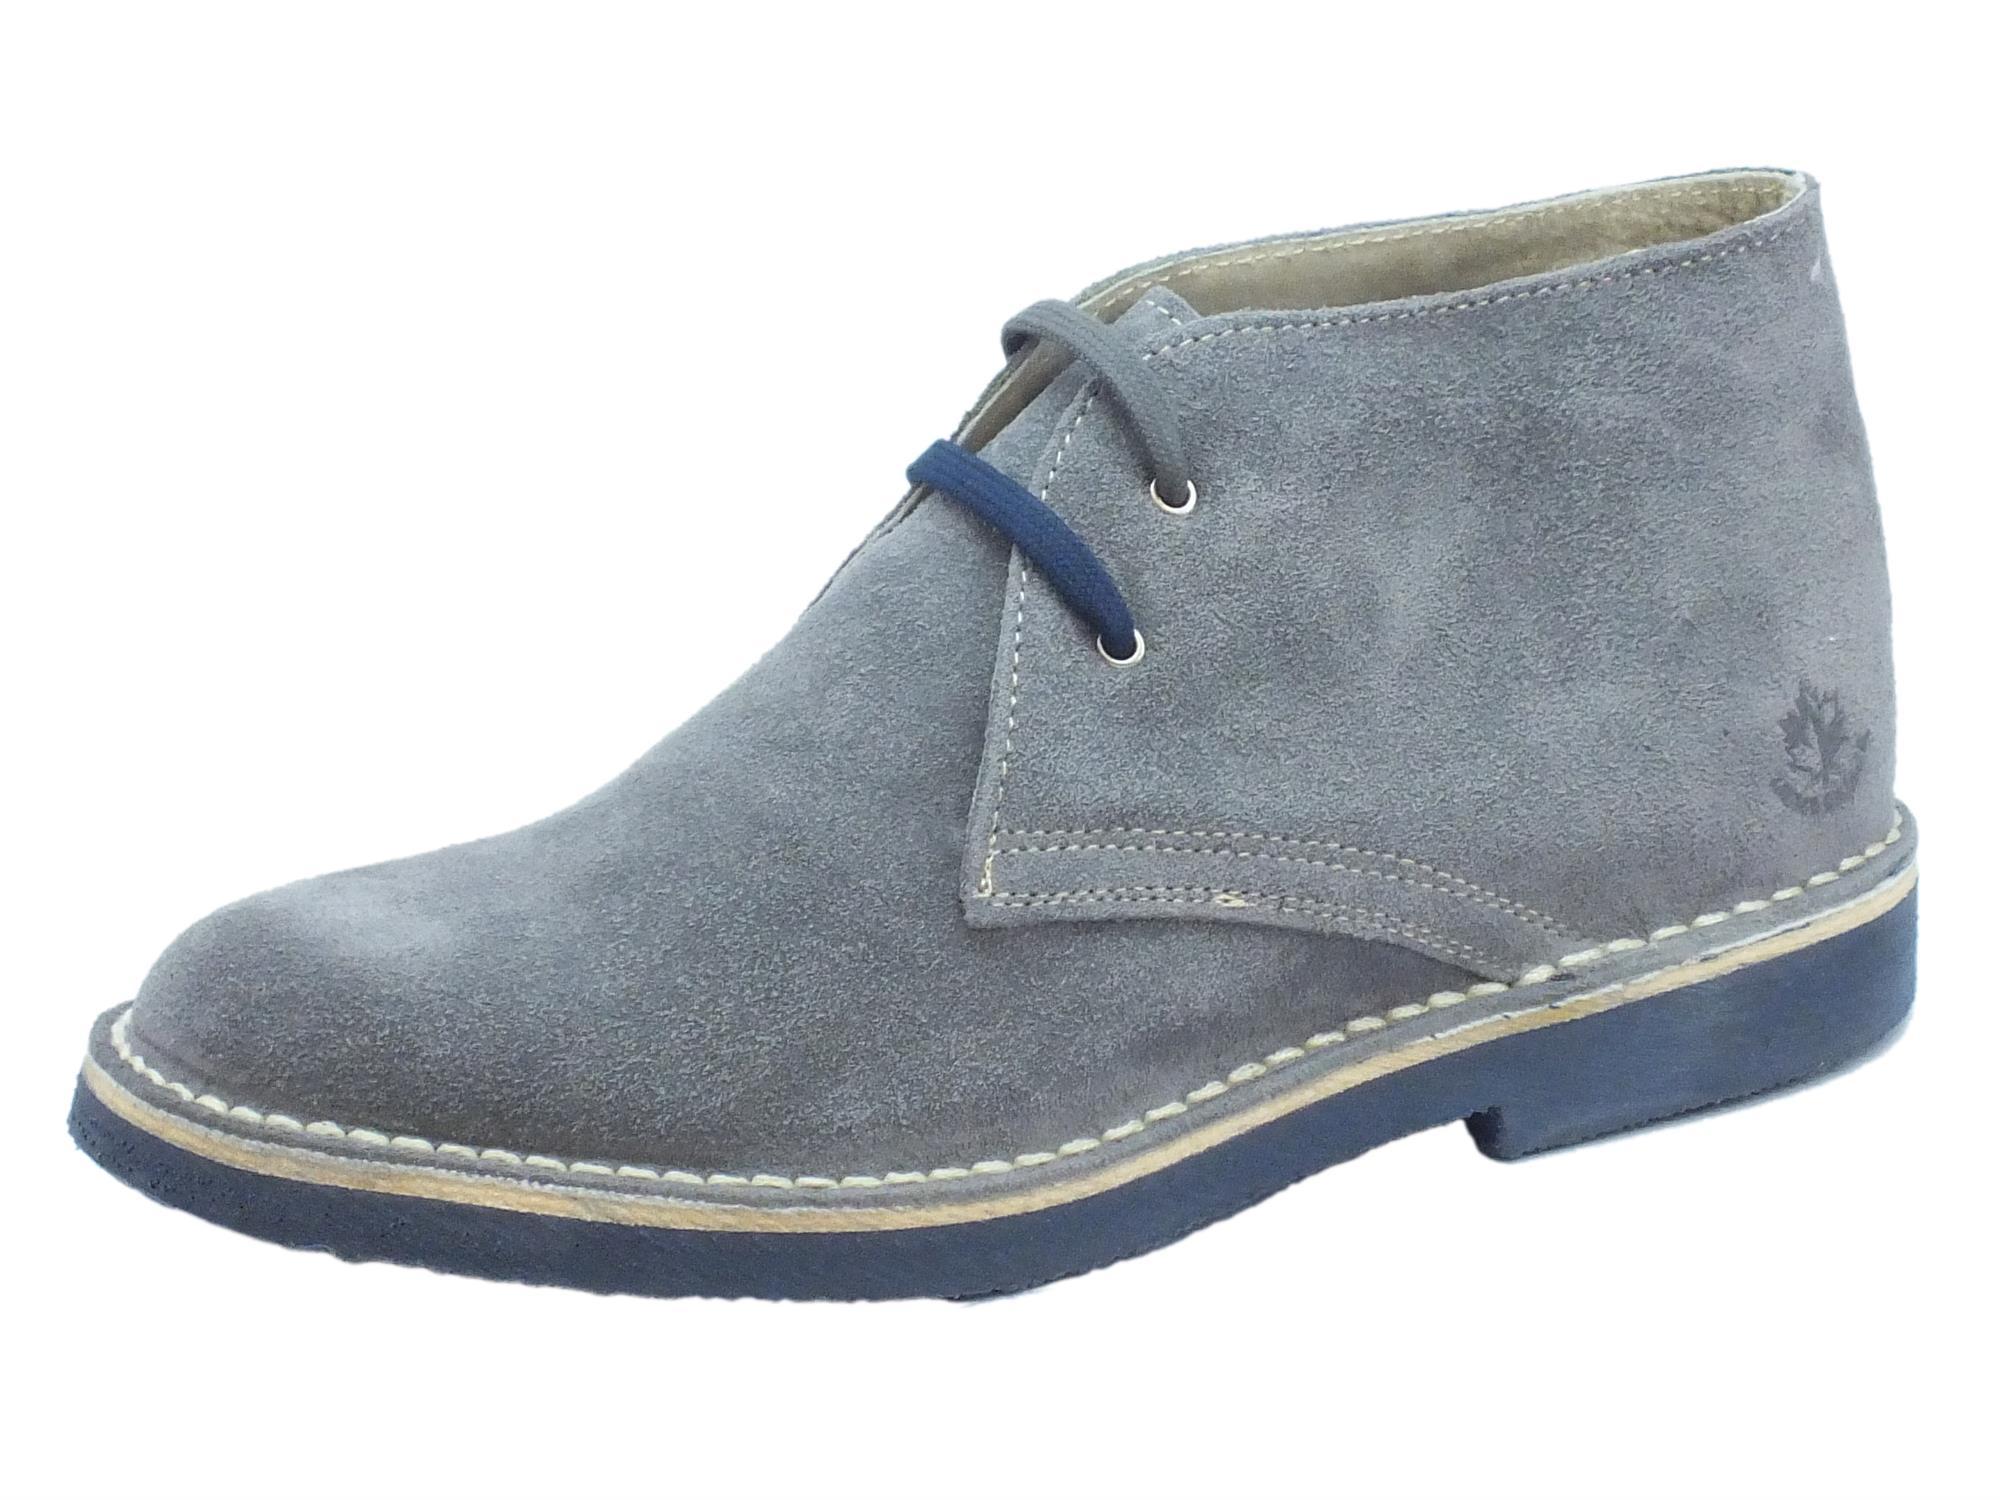 7cd1ad8860 Polacchina Lumberjack GABLE per uomo in nabuk grigio fondo blue